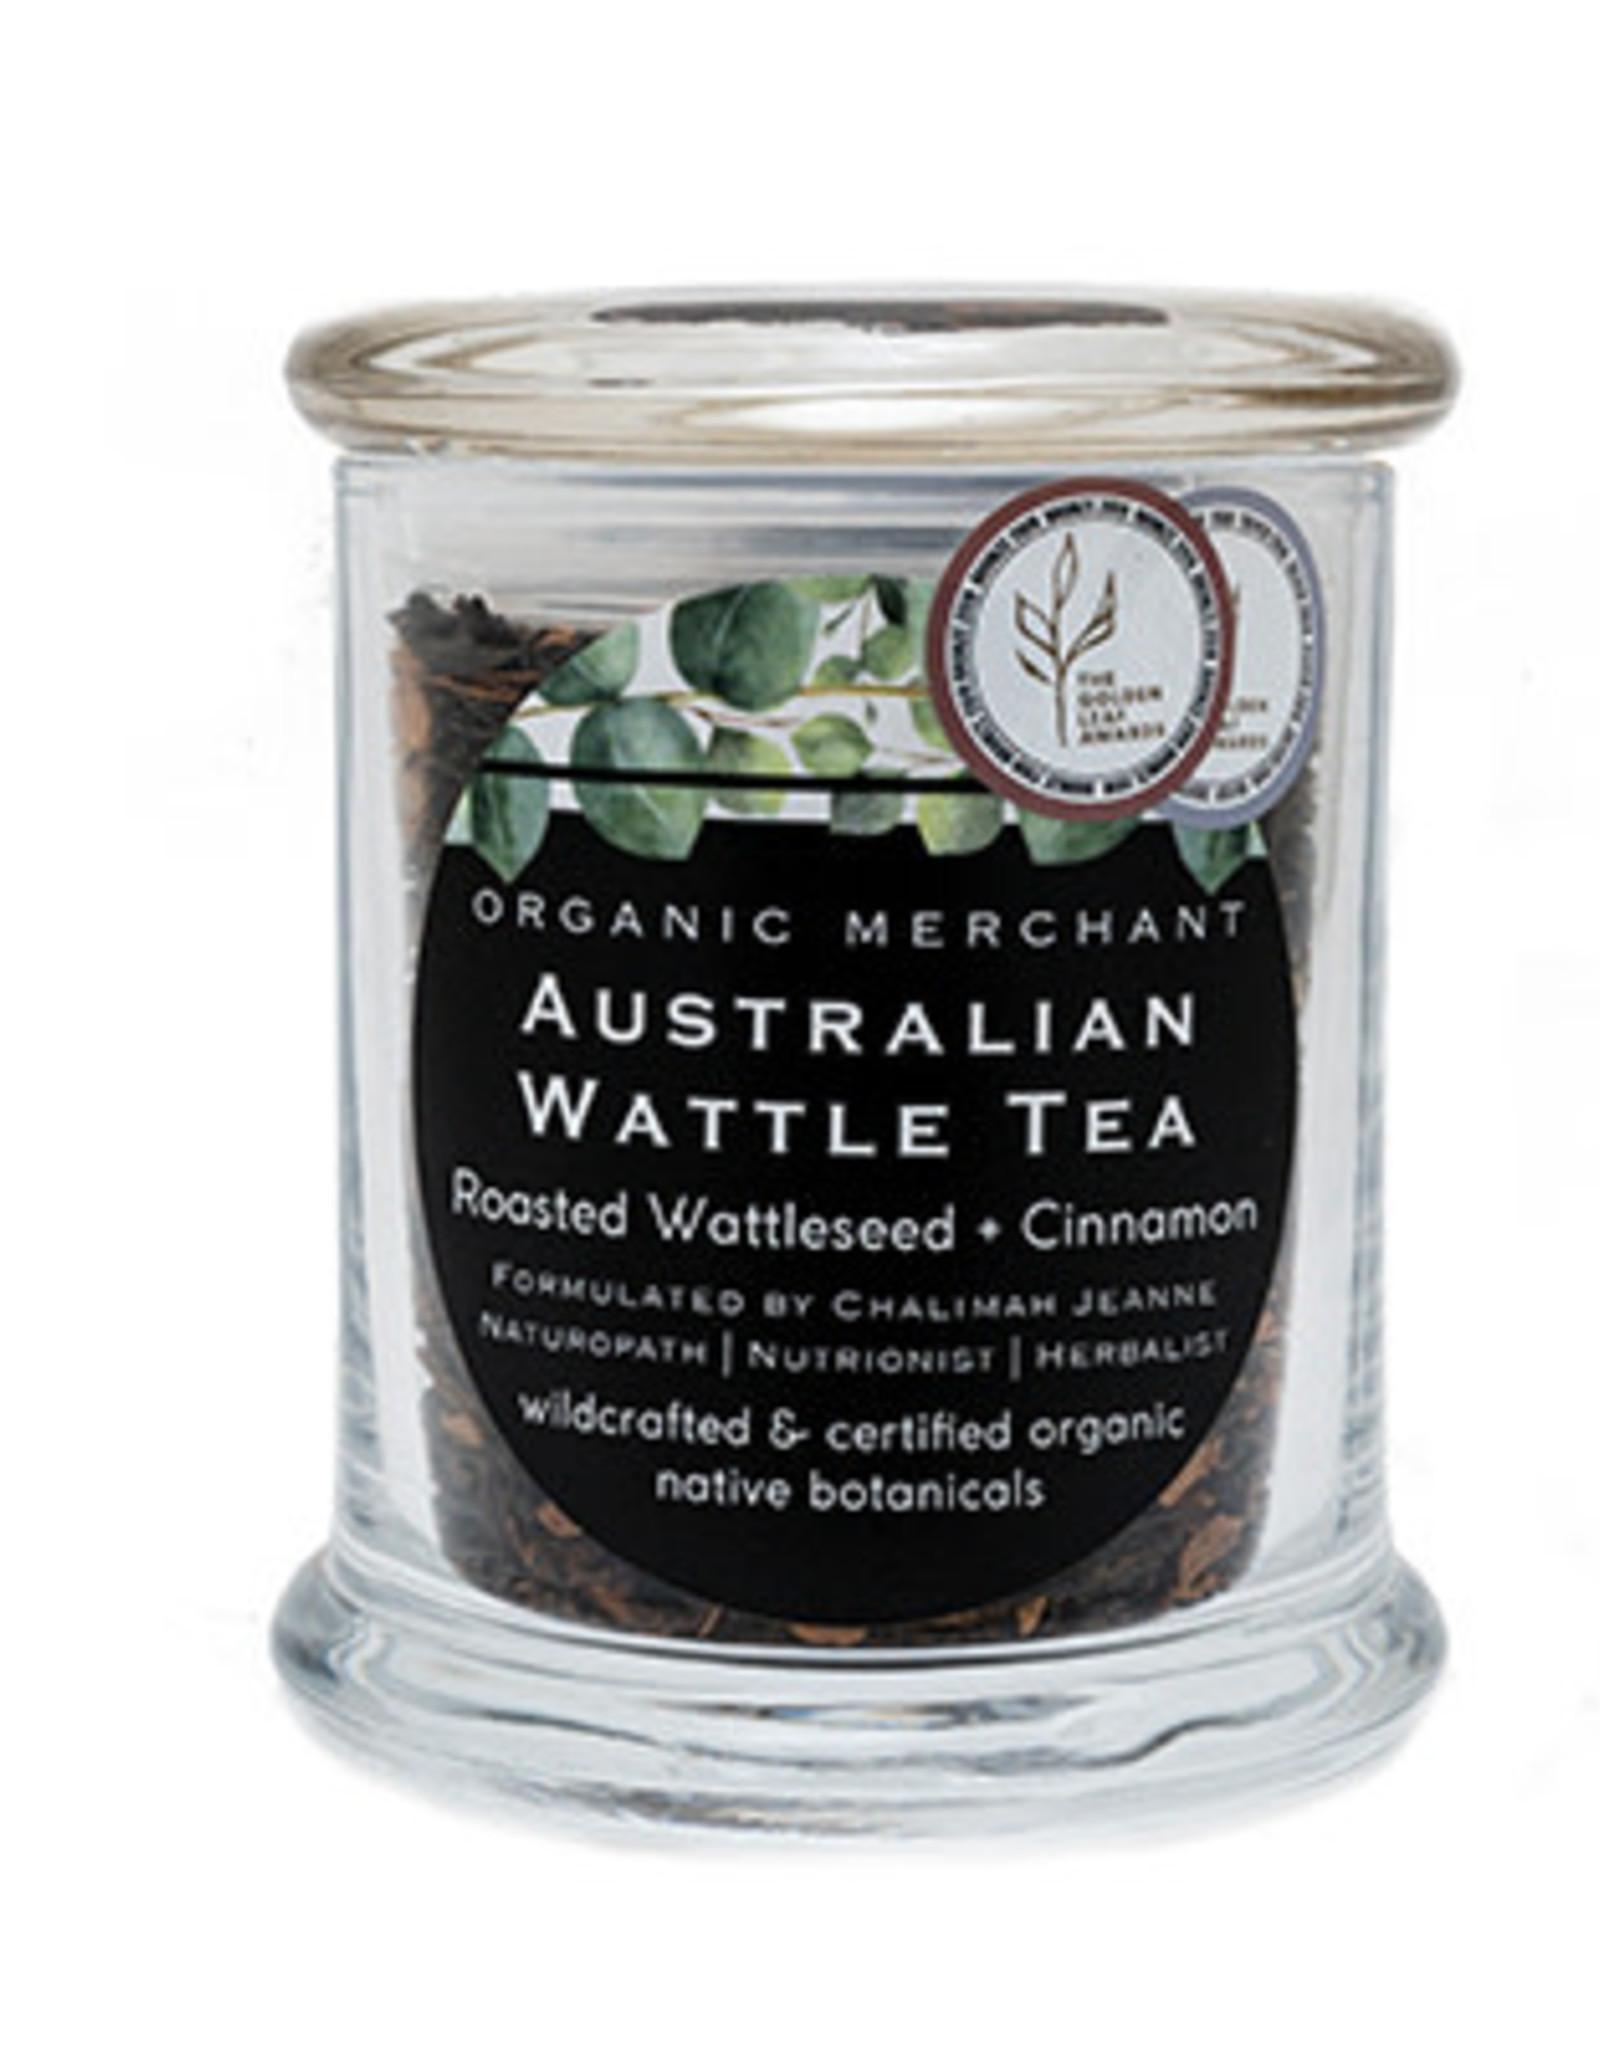 Organic Merchant Australian Wattle Tea 80g